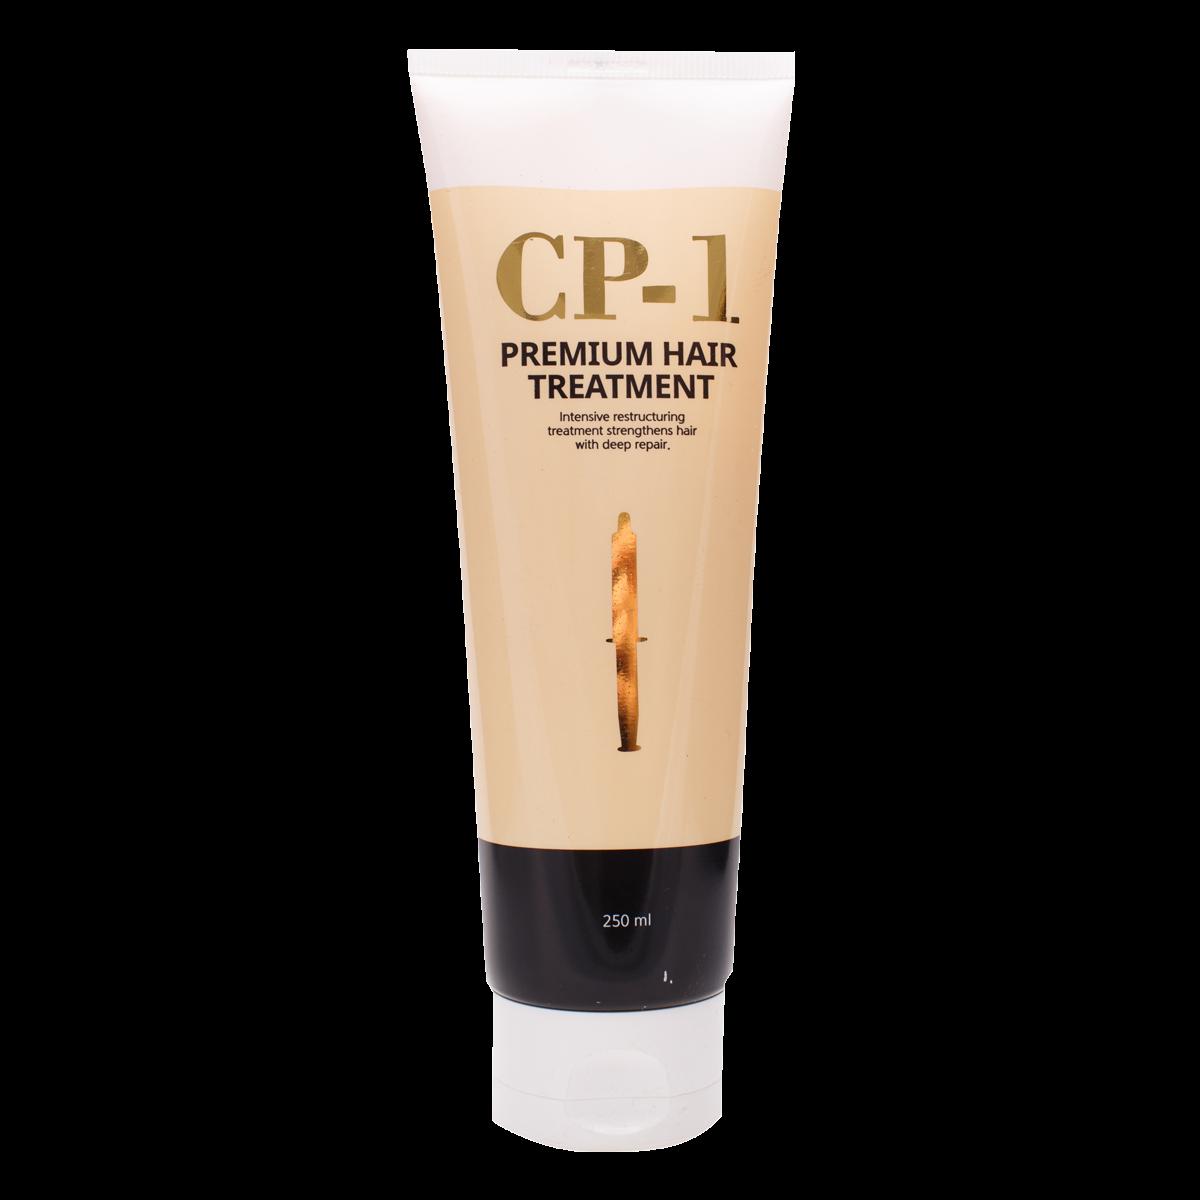 Маска для волос CP-1 Premium Protein Treatment